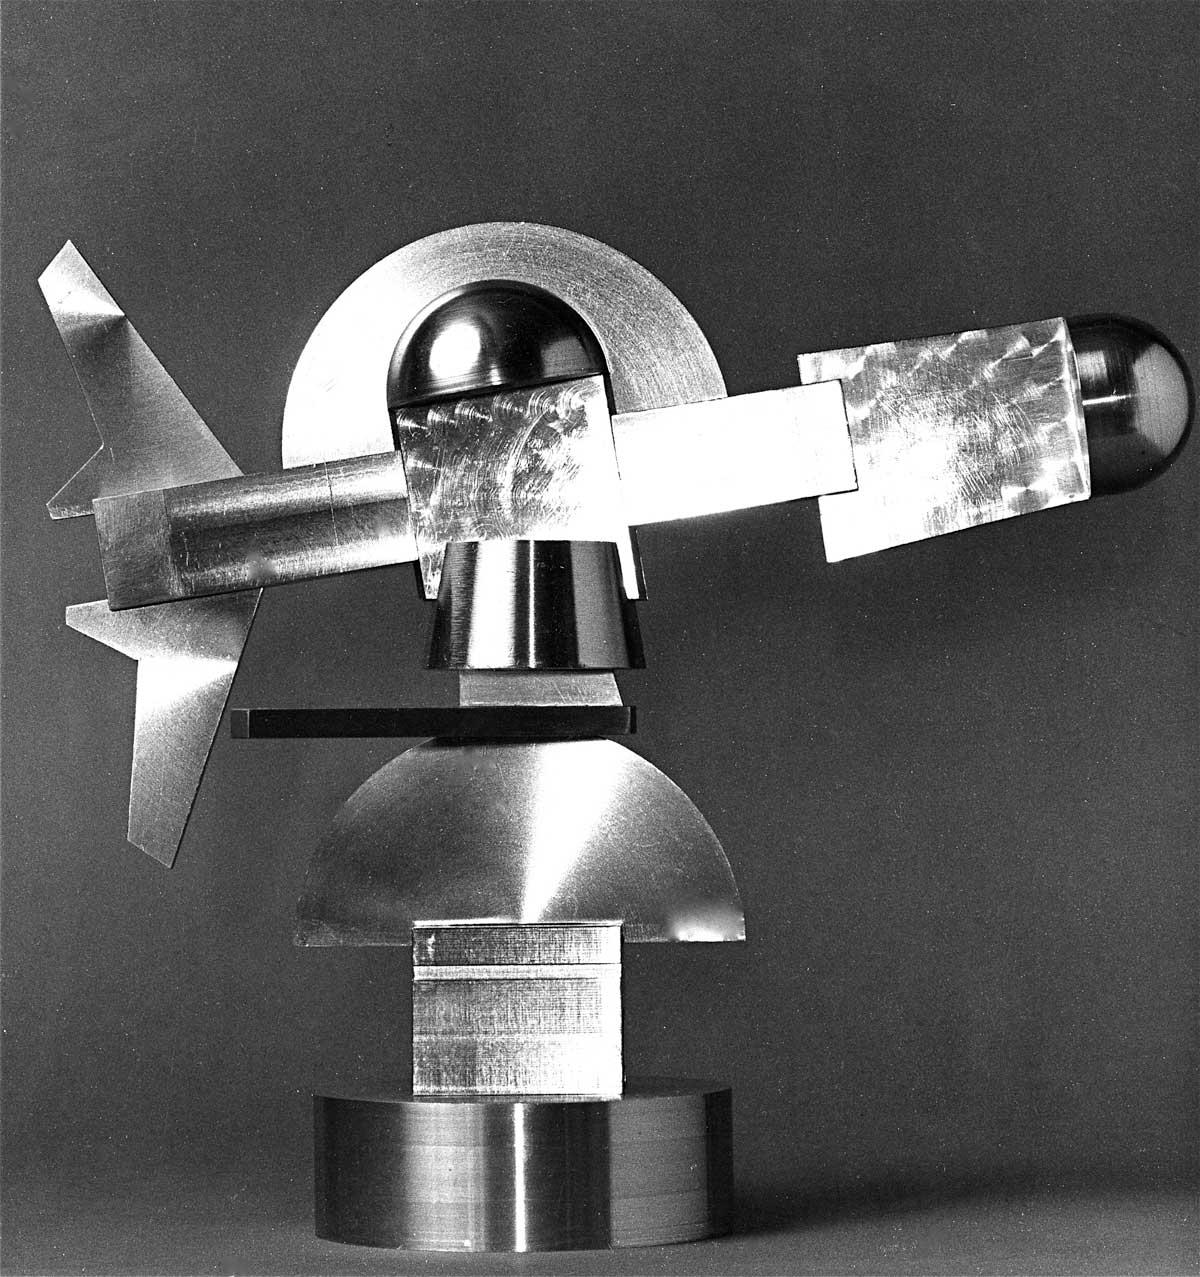 14-ENGIN-PRET-03